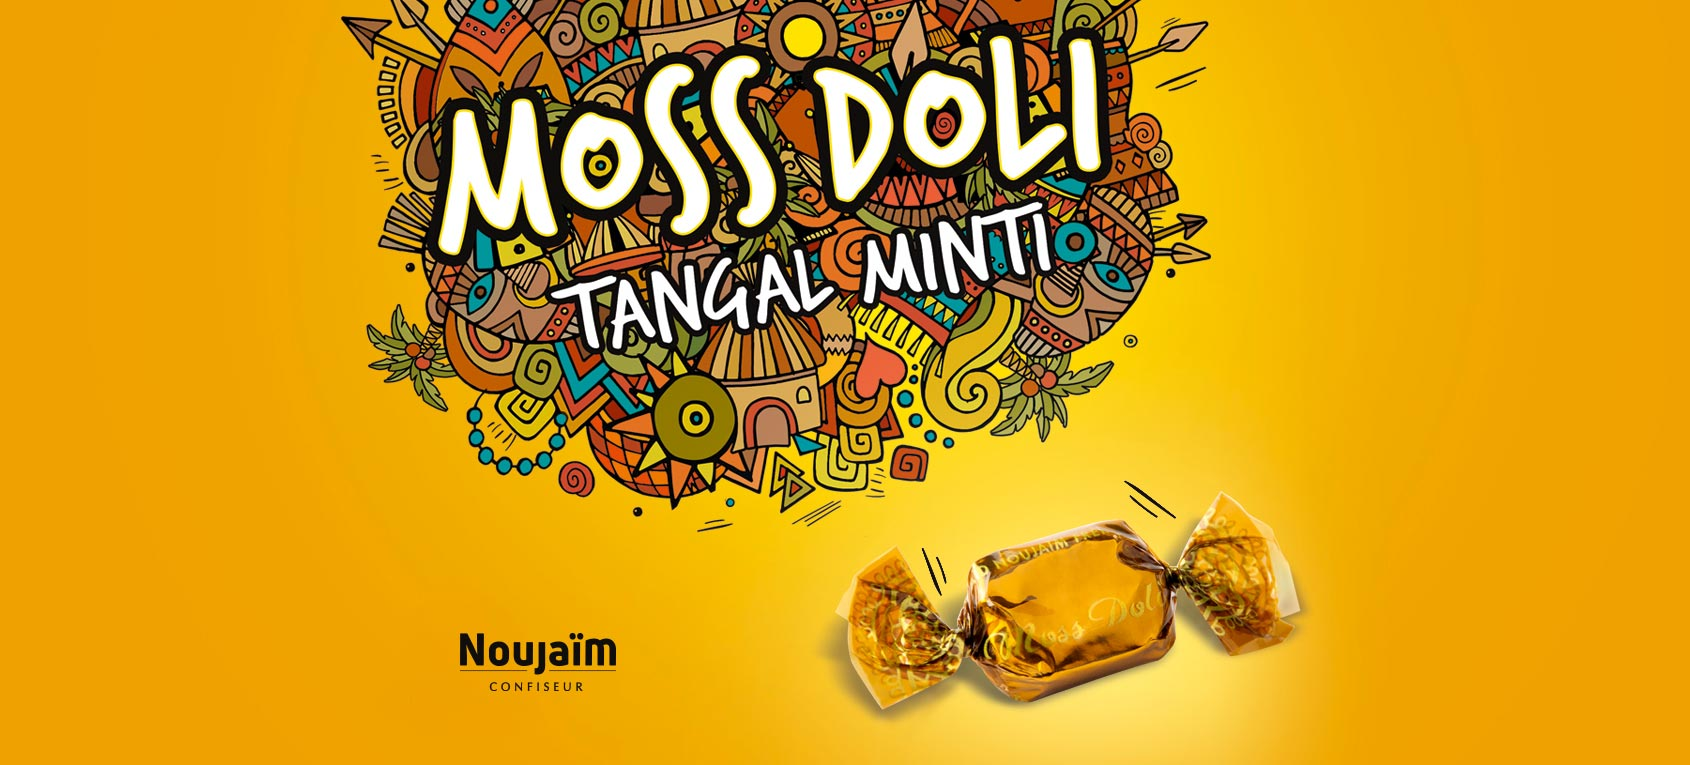 MOSS-DOLI